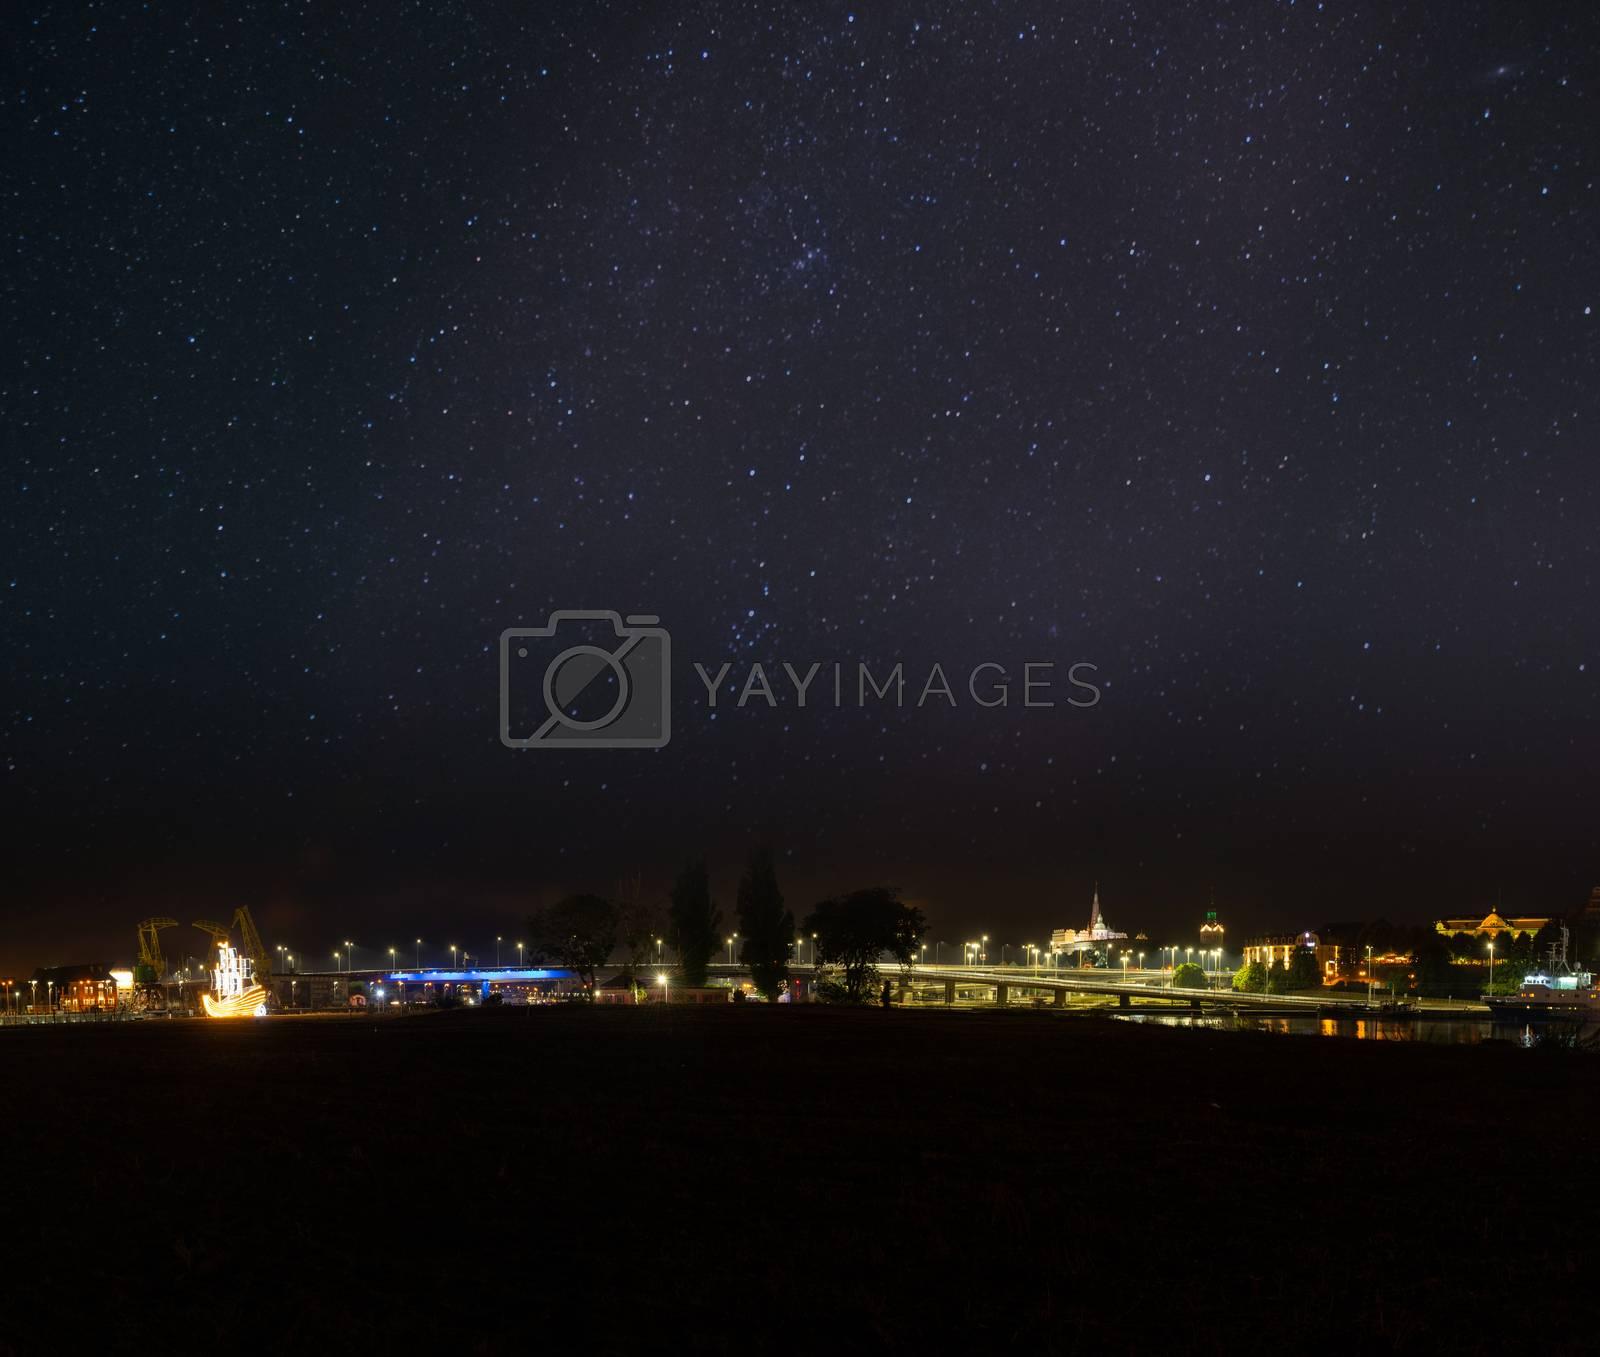 Szczecin. Night view from across the river to the illuminated historic center. Odra river. Chrobry embankments in Szczecin